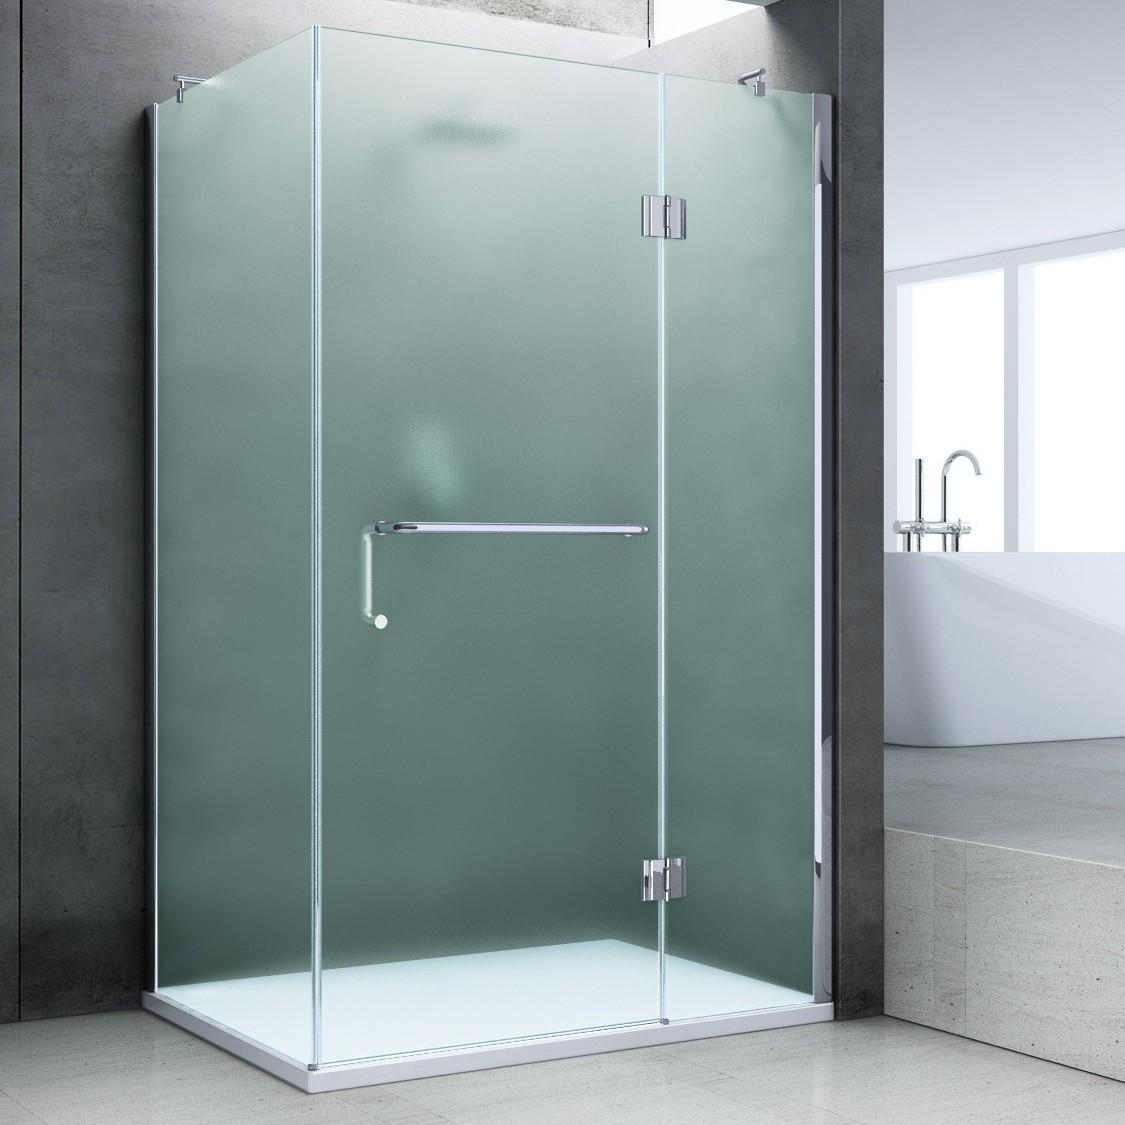 Vetri box doccia - Vetri per doccia ...